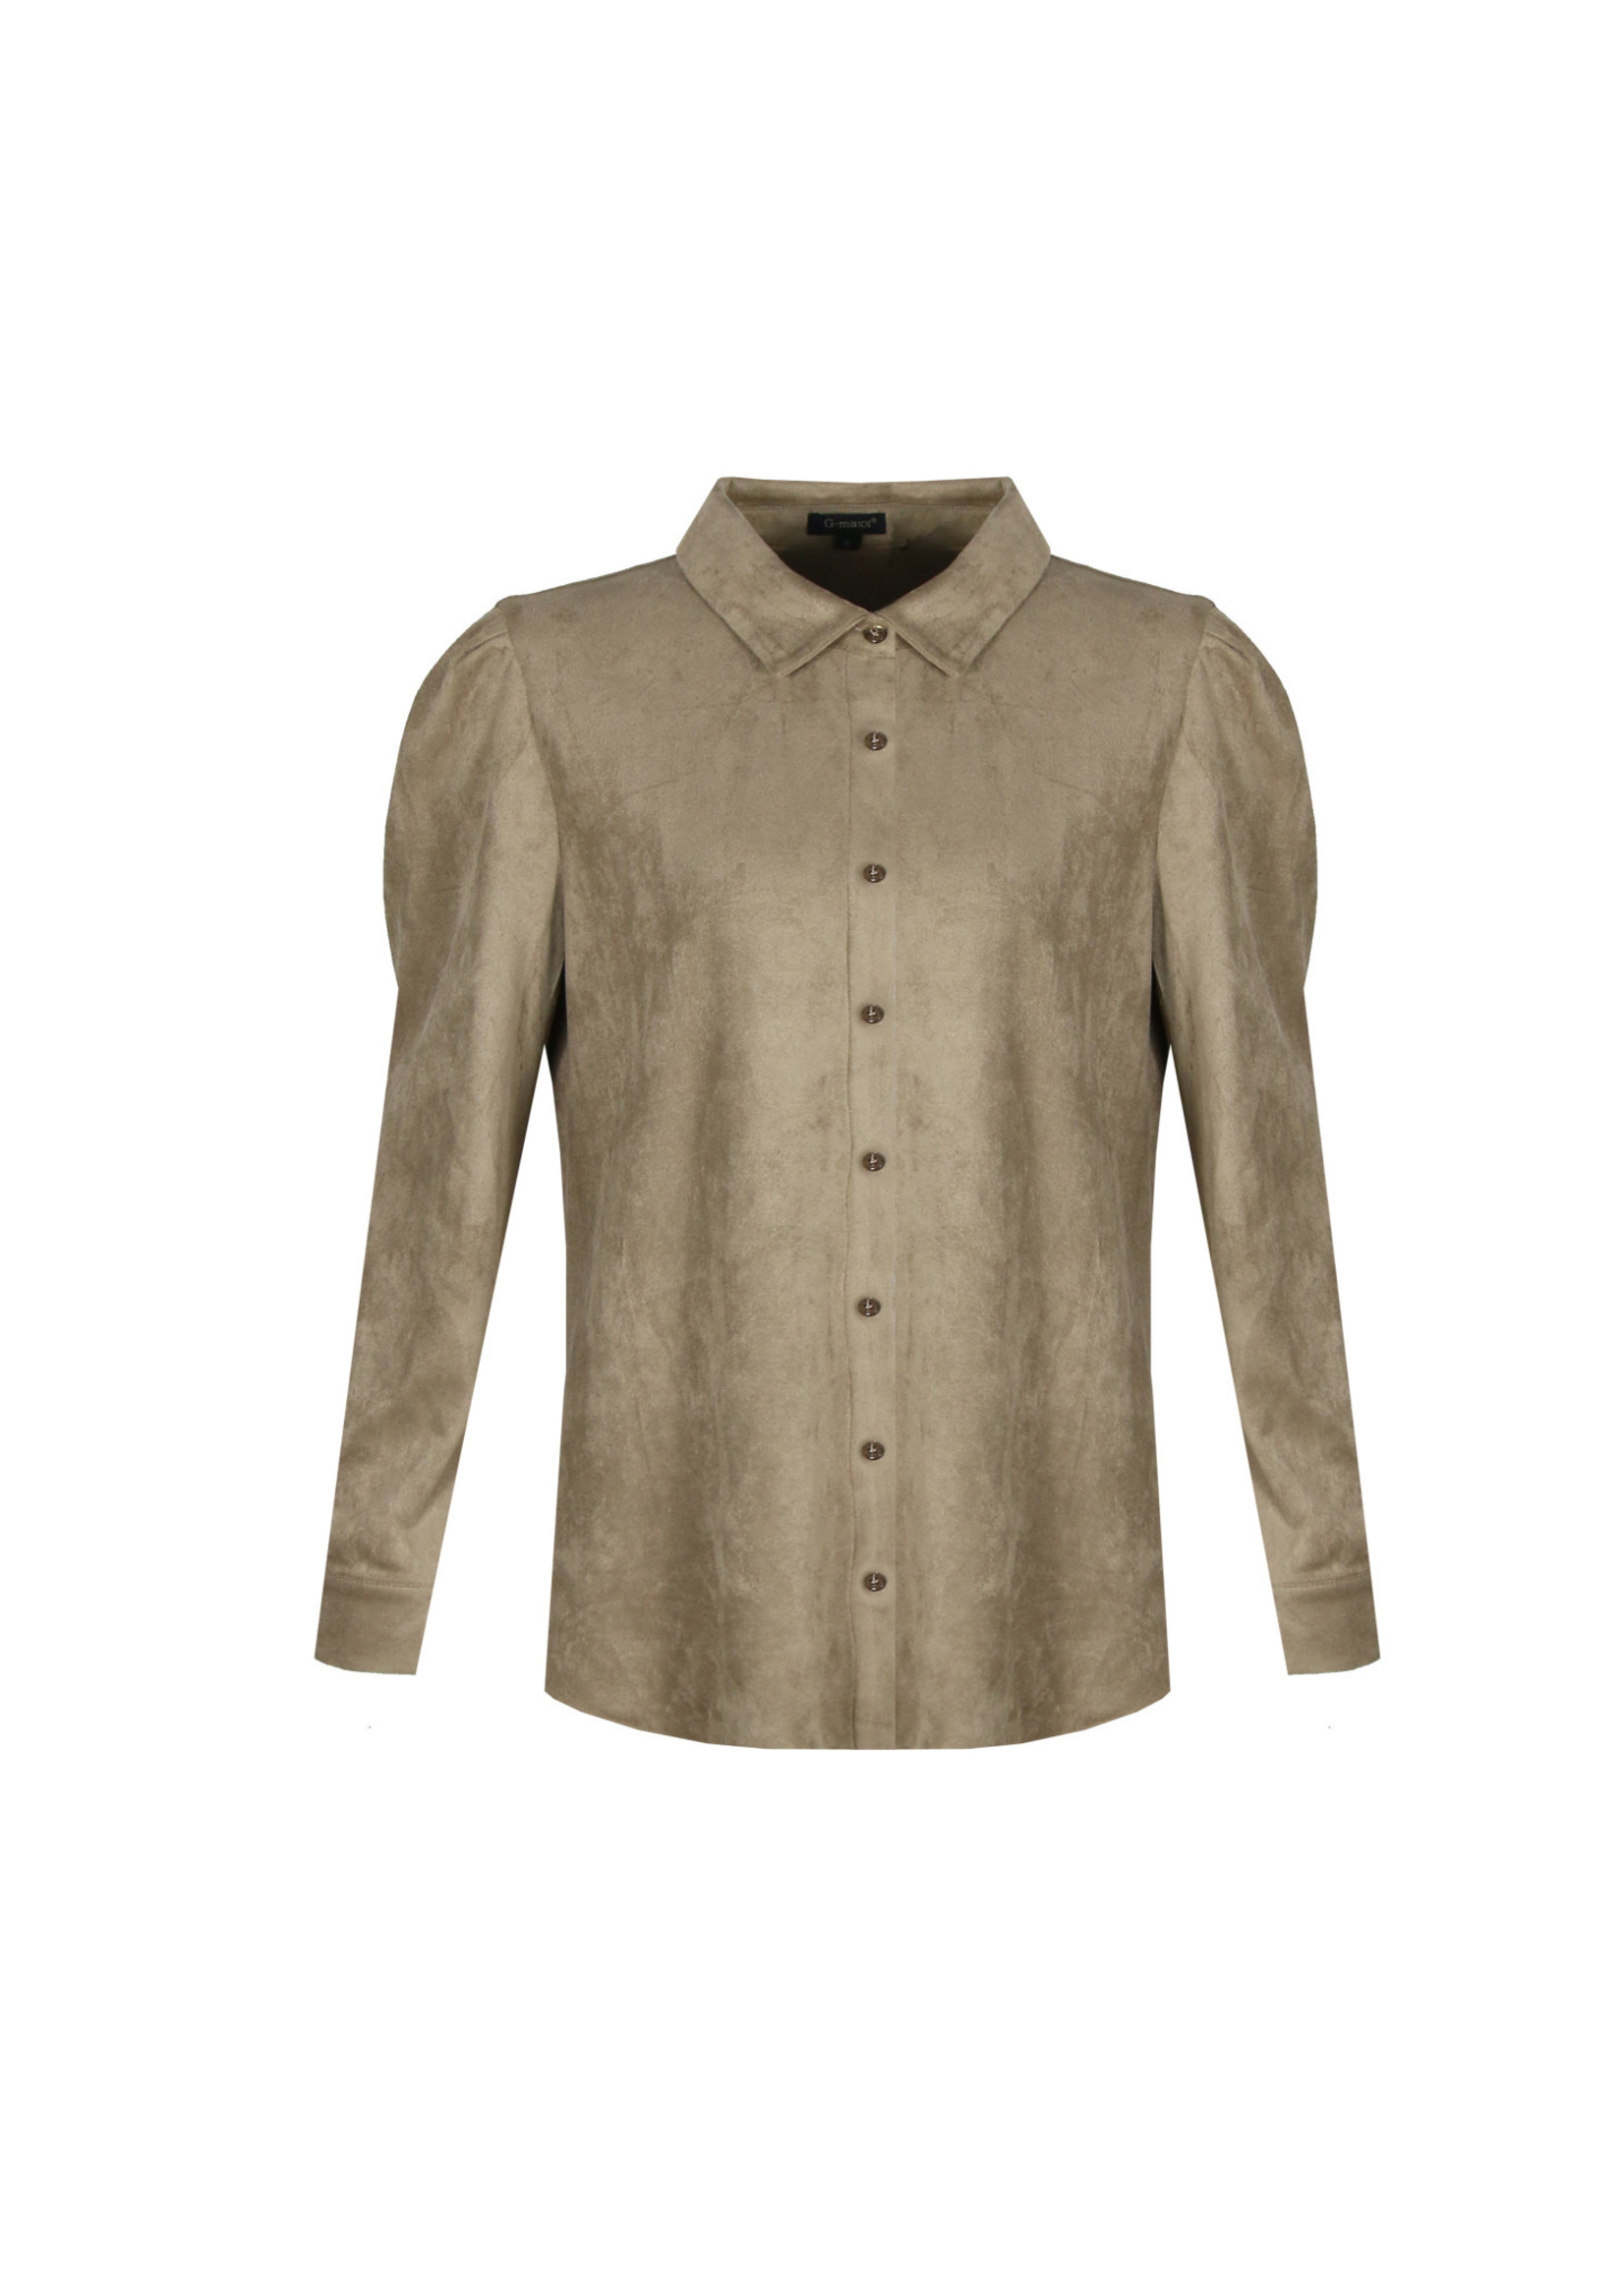 G-Maxx G-maxx - Kristie blouse - 21WYG02-51